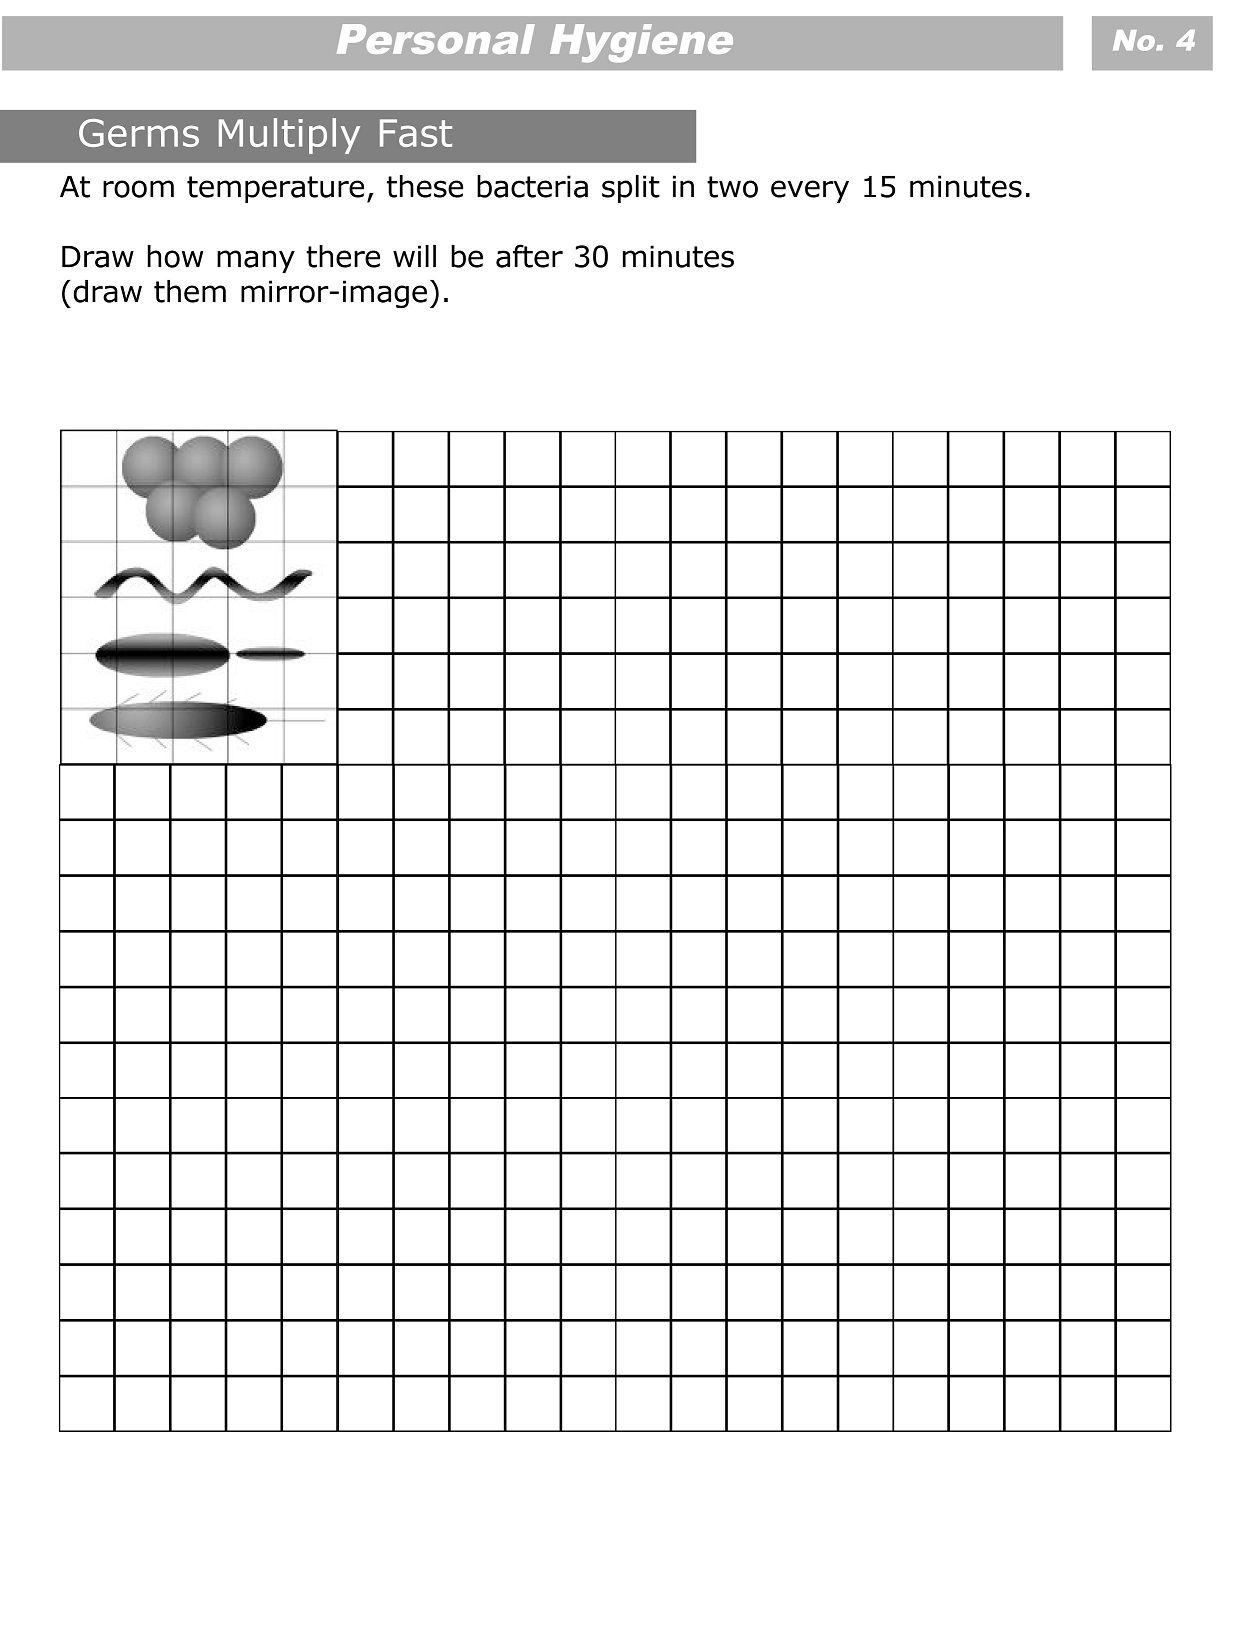 Personal Hygiene Worksheets For Kids Level 3 4